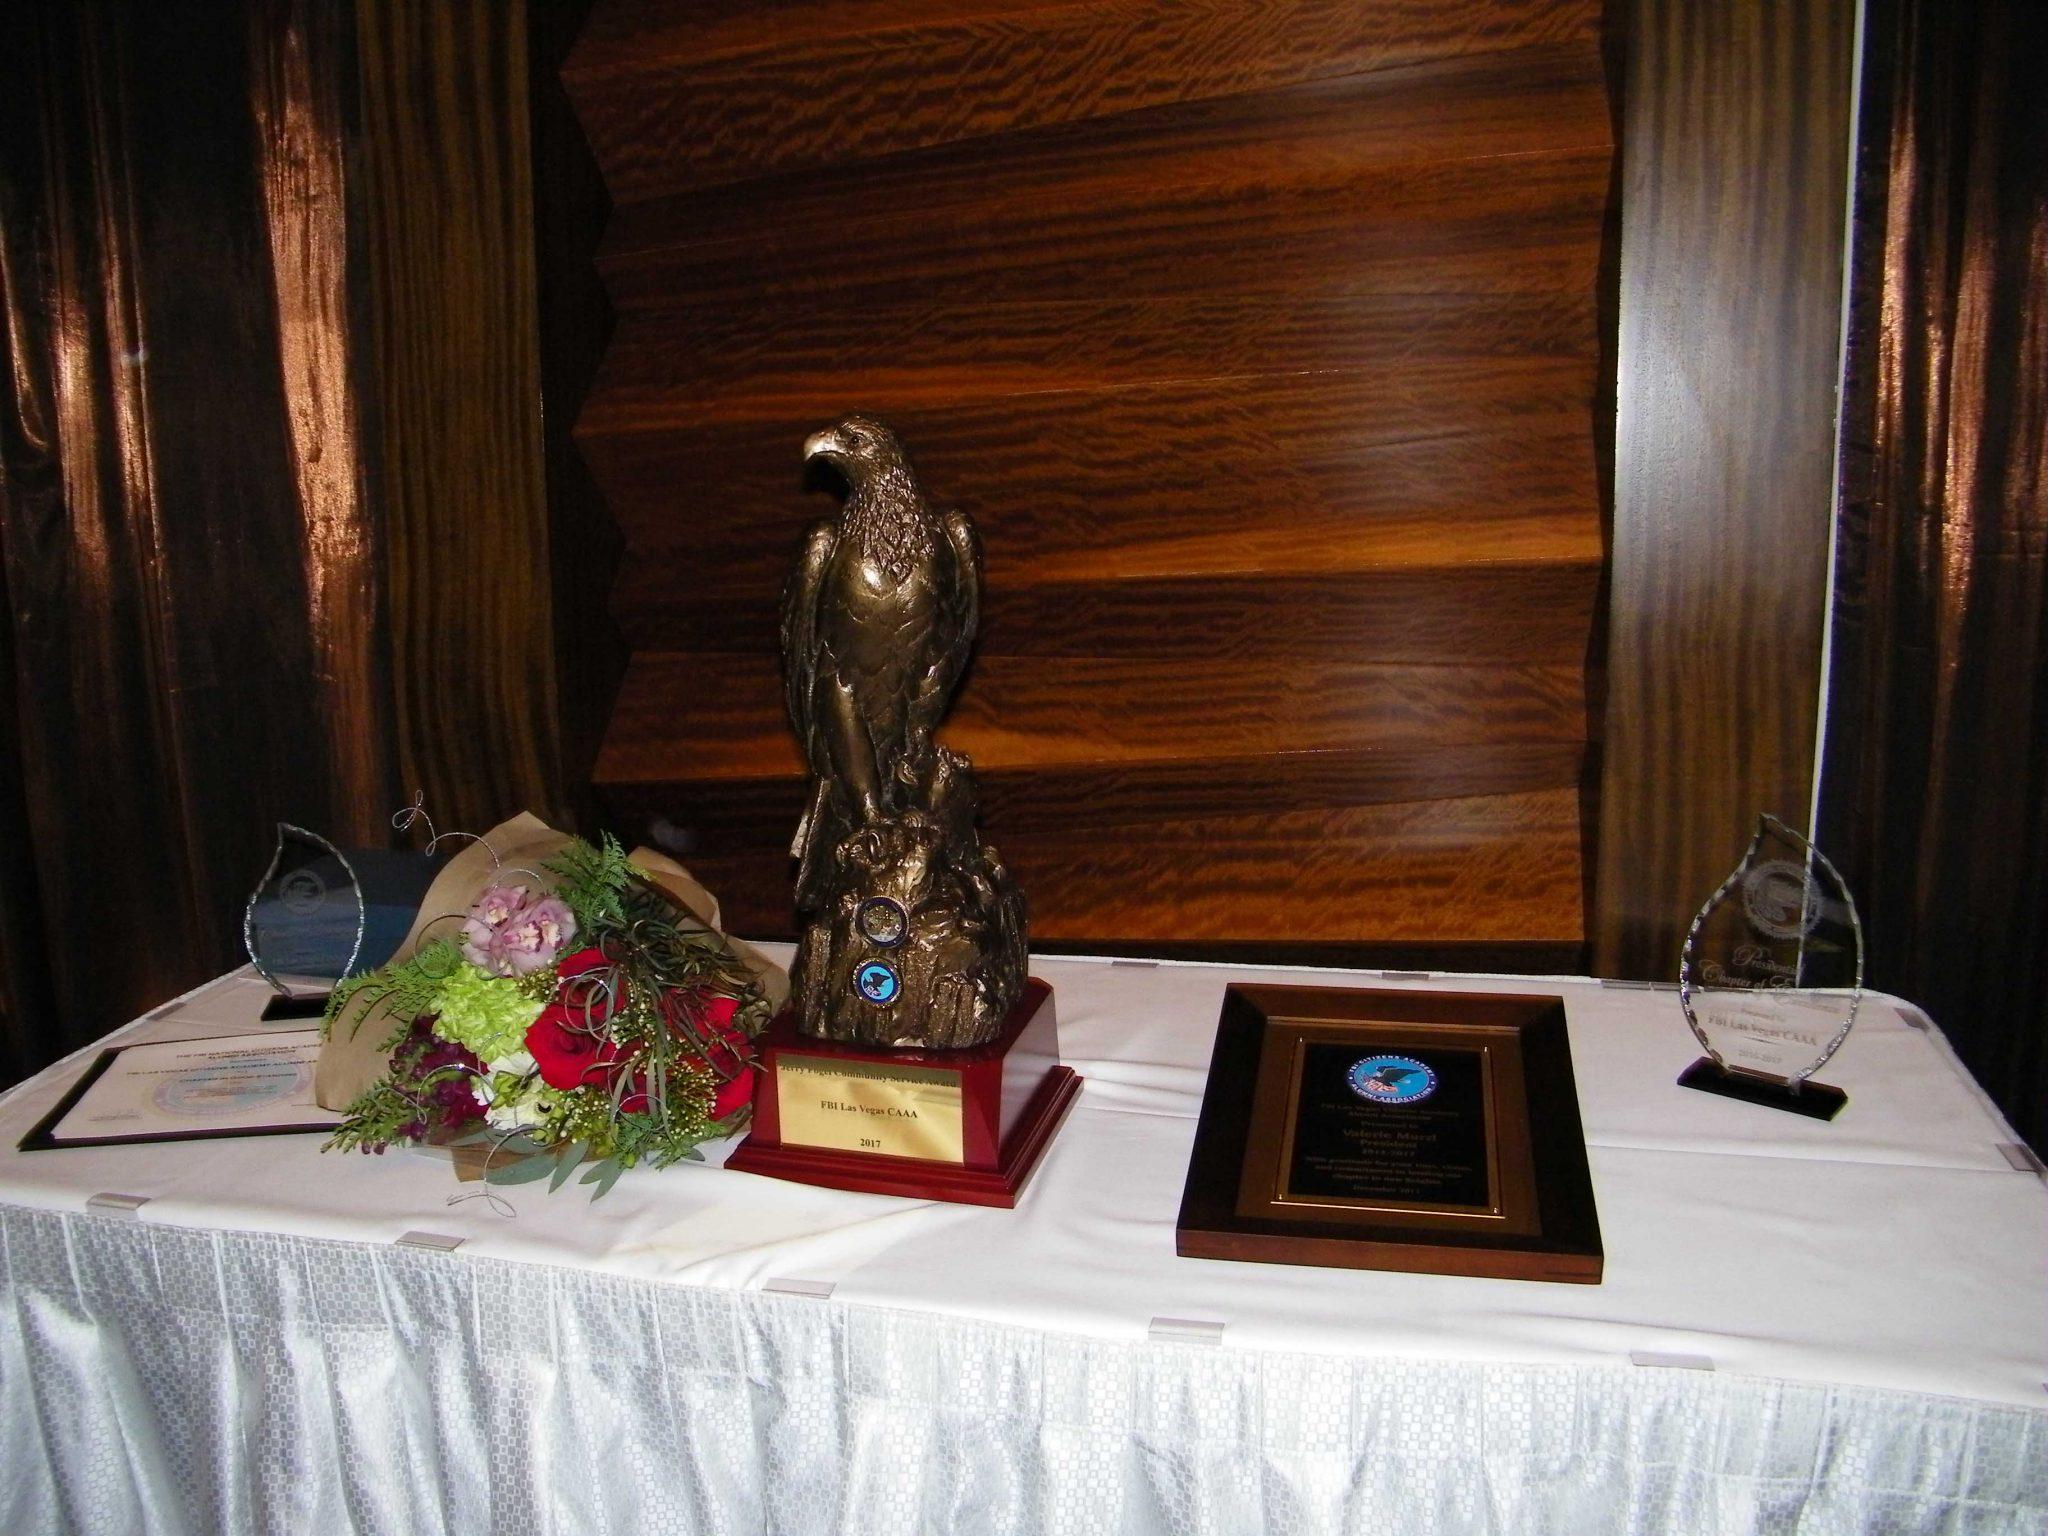 The Jerry Fogel Community Service Award